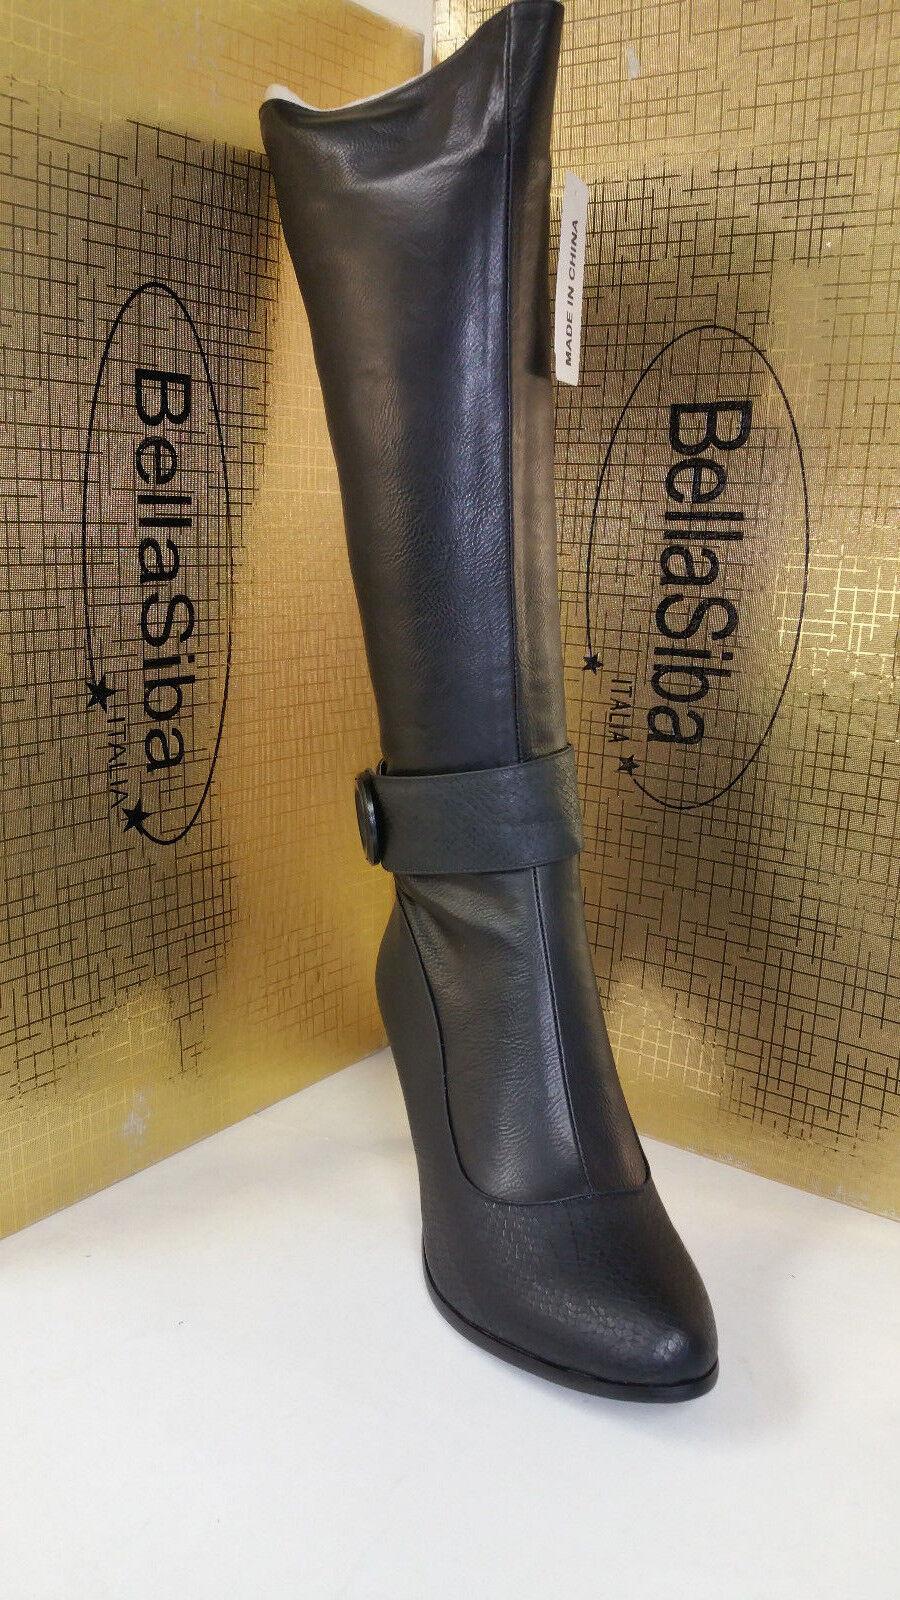 Bella Bella Bella Siba Italia Black Womens Knee High Heel Fashion Boots size 37-41 21081 e447cc